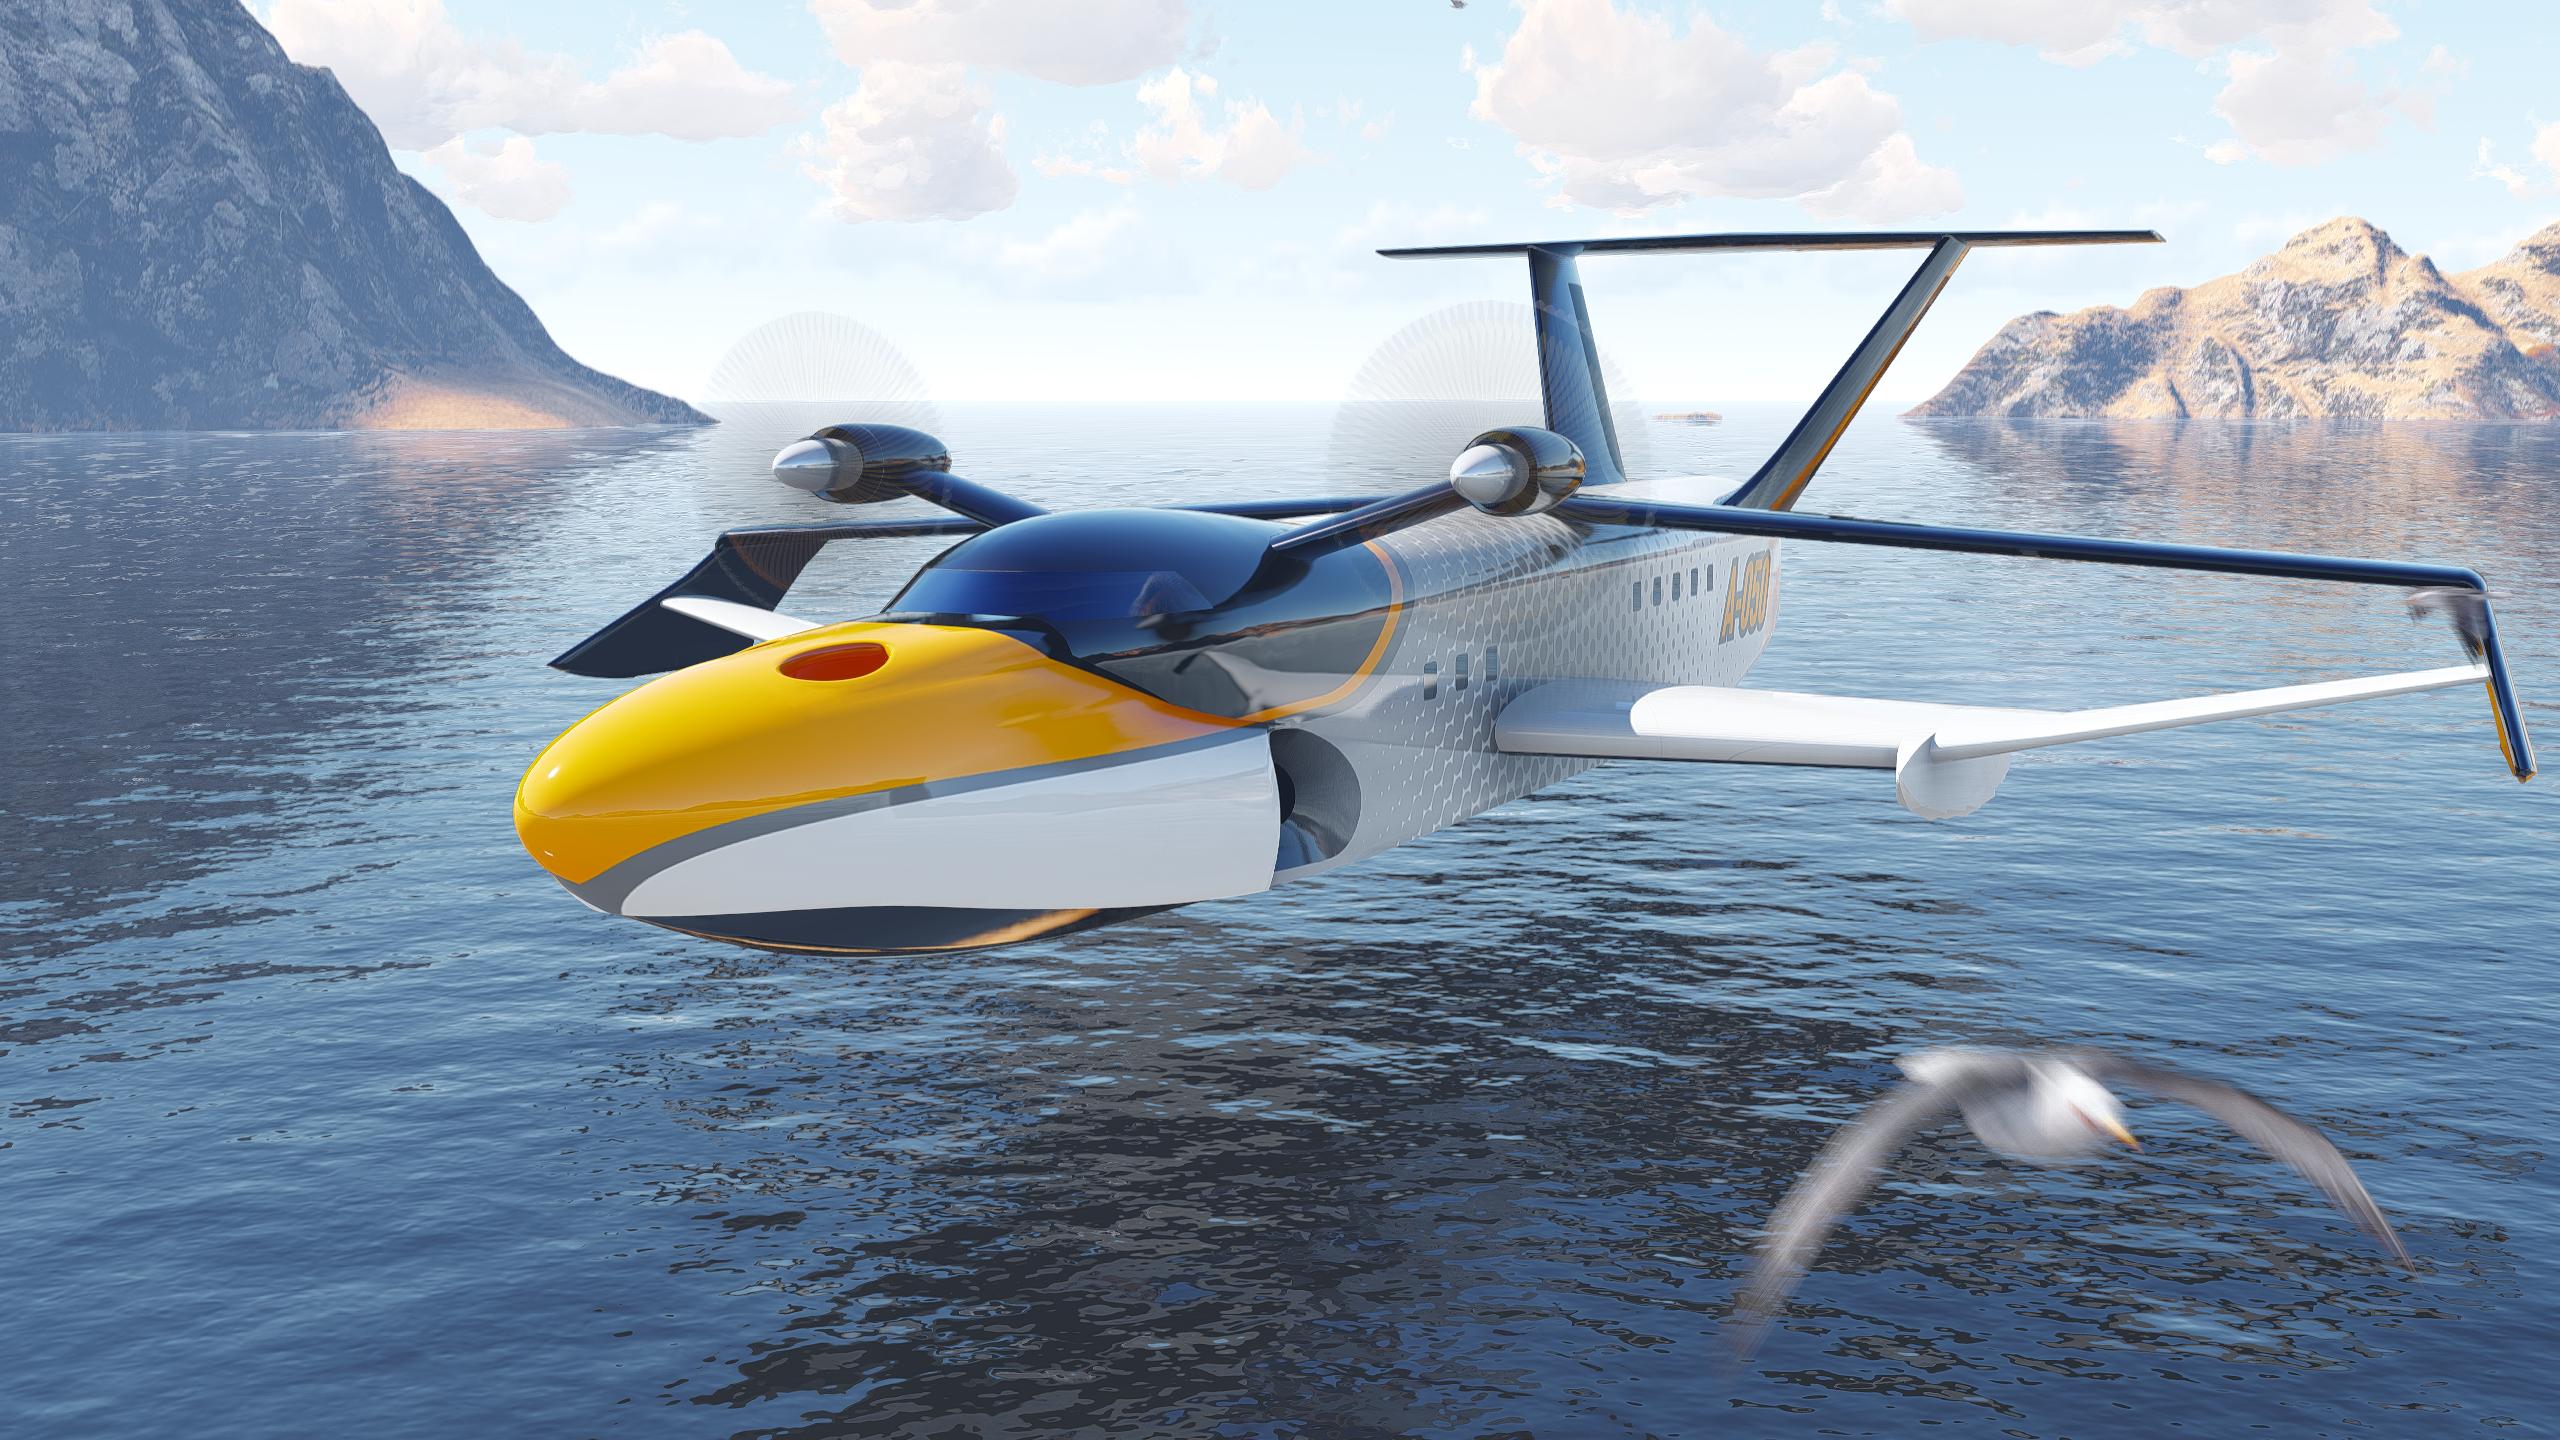 Design And Creation Of Innovative Multipurpose High Speed Transport